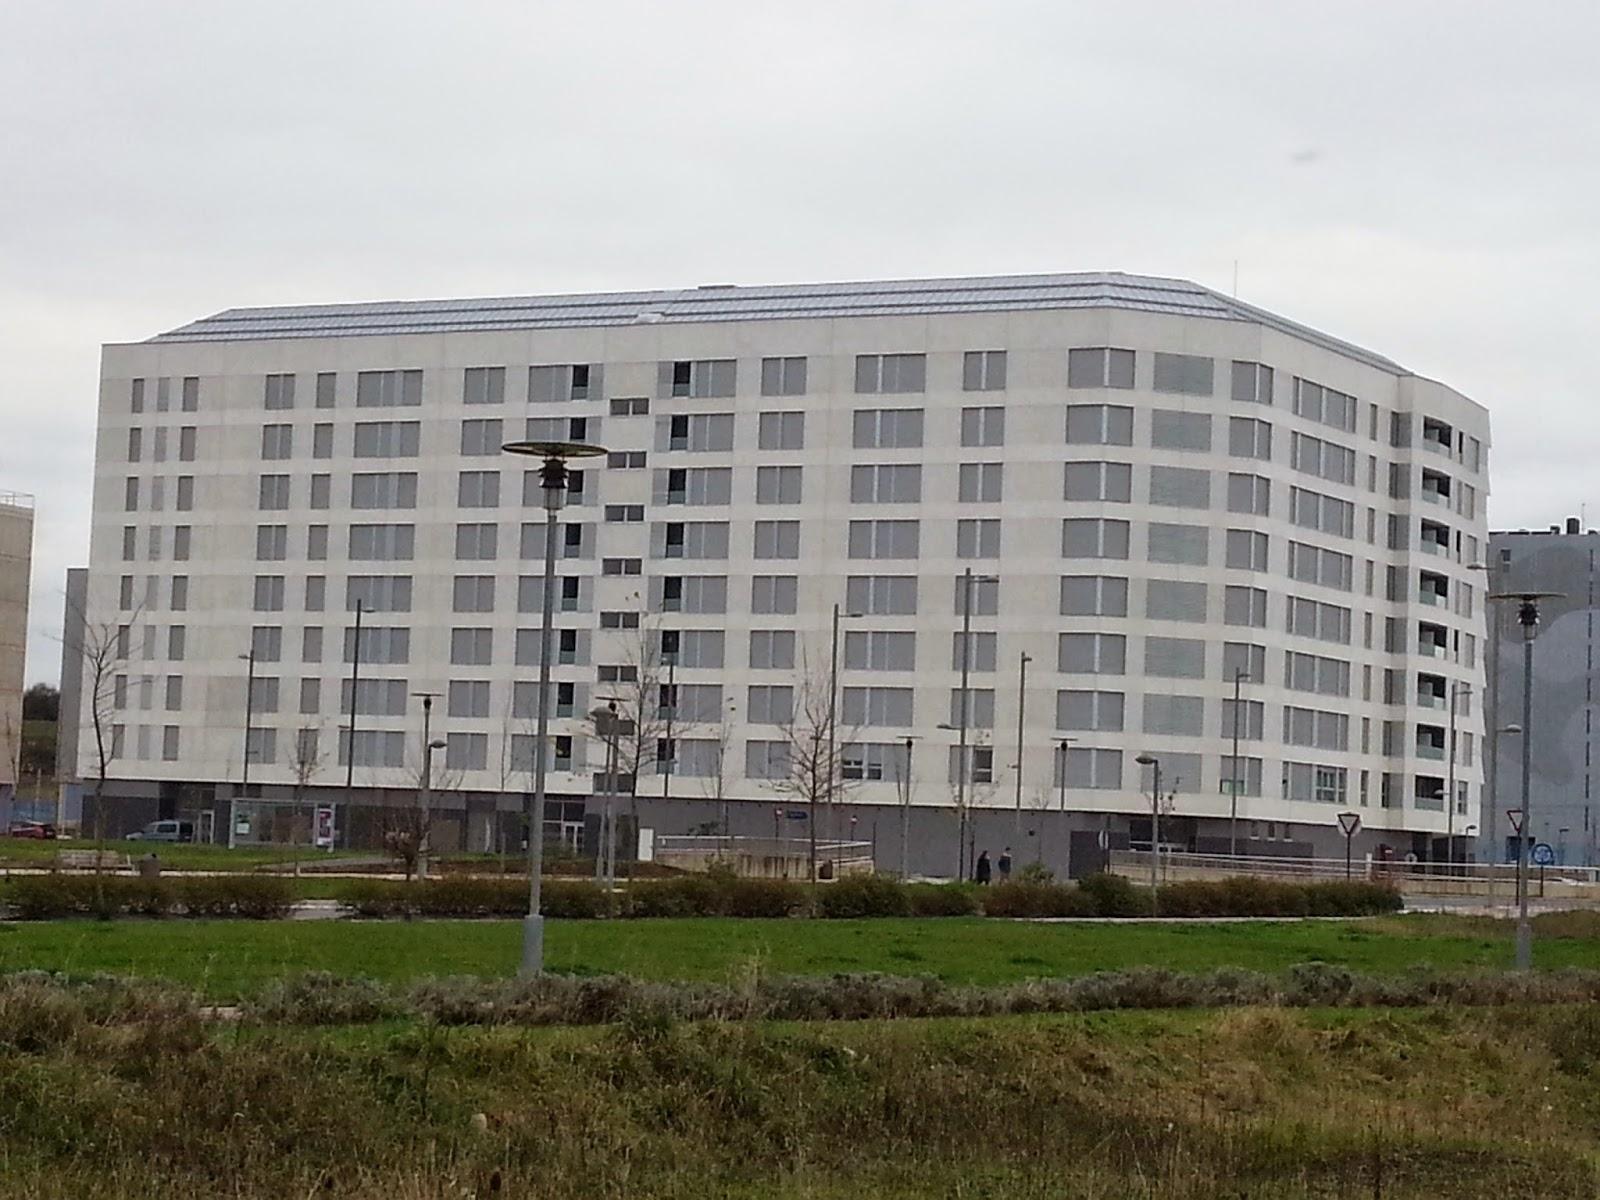 Edificio polemico en Arkayate-Arkaiate